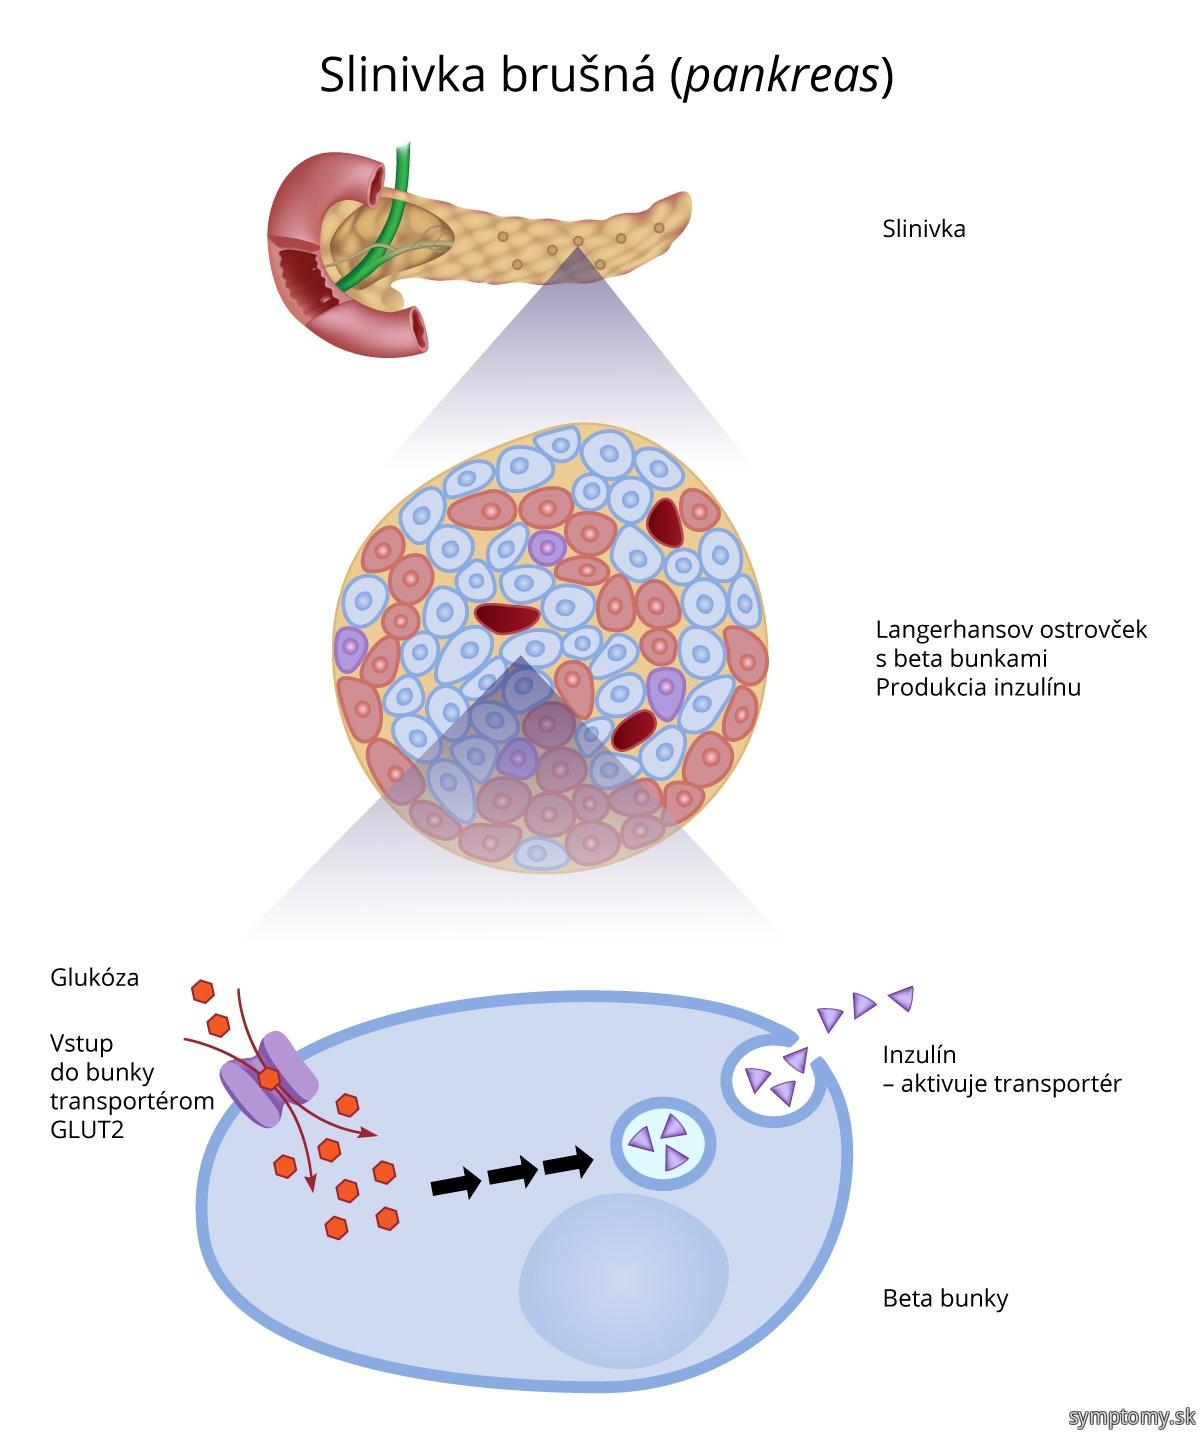 Slinivka brušná-pankreas